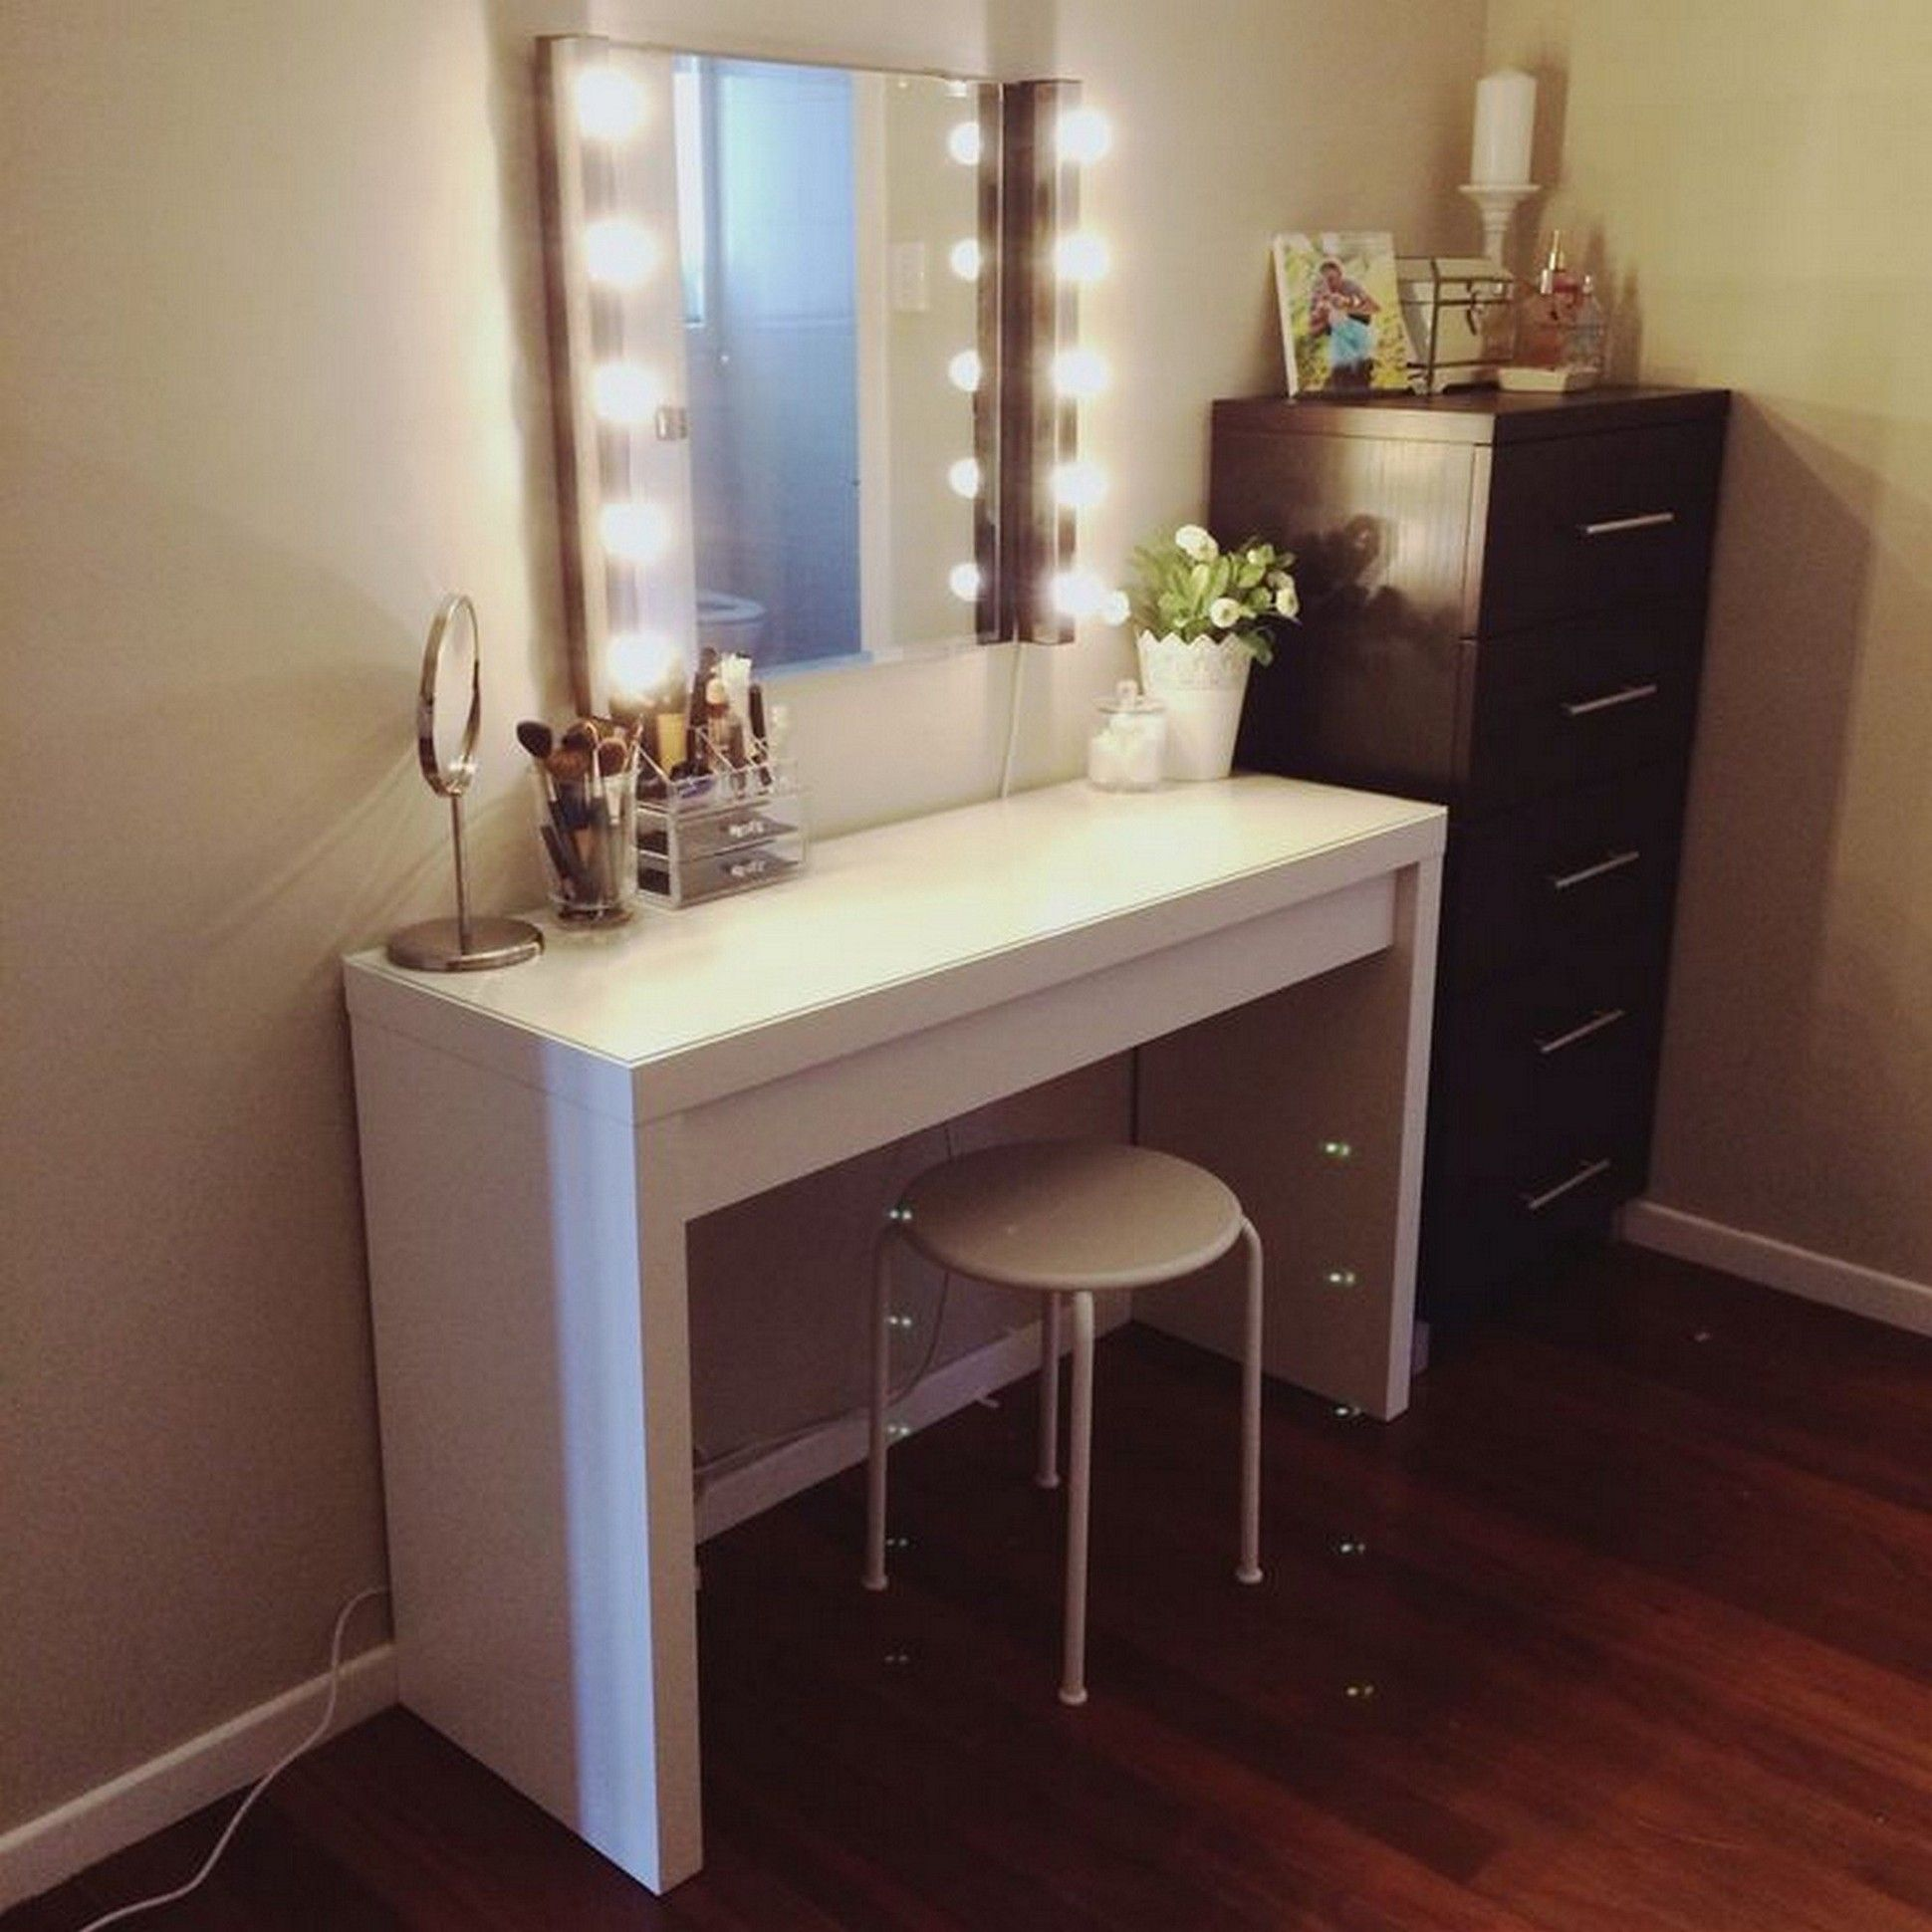 25 Diy Vanity Mirror Ideas With Lights Mab Ikea Vanity Bedroom Vanity Set Diy Vanity Mirror